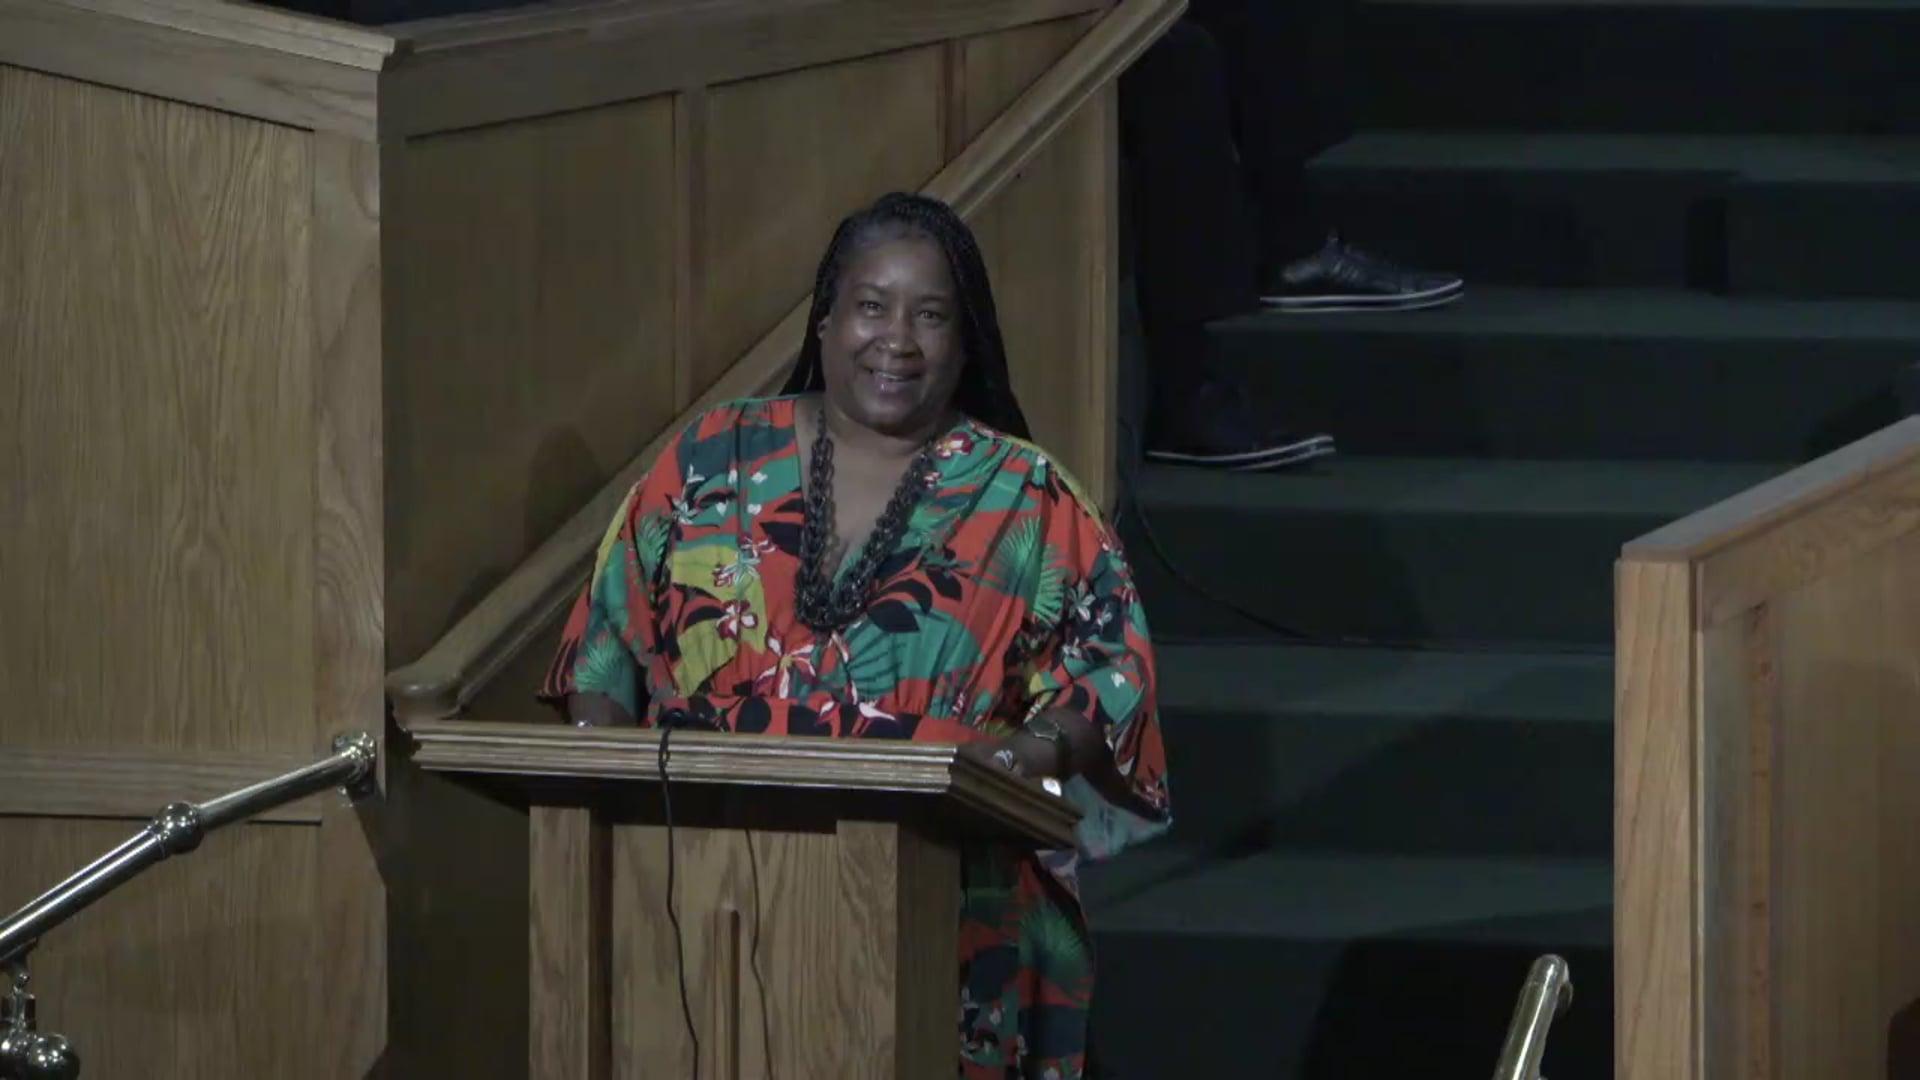 Mt Zion return to indoor worship       Aug 15, 2021